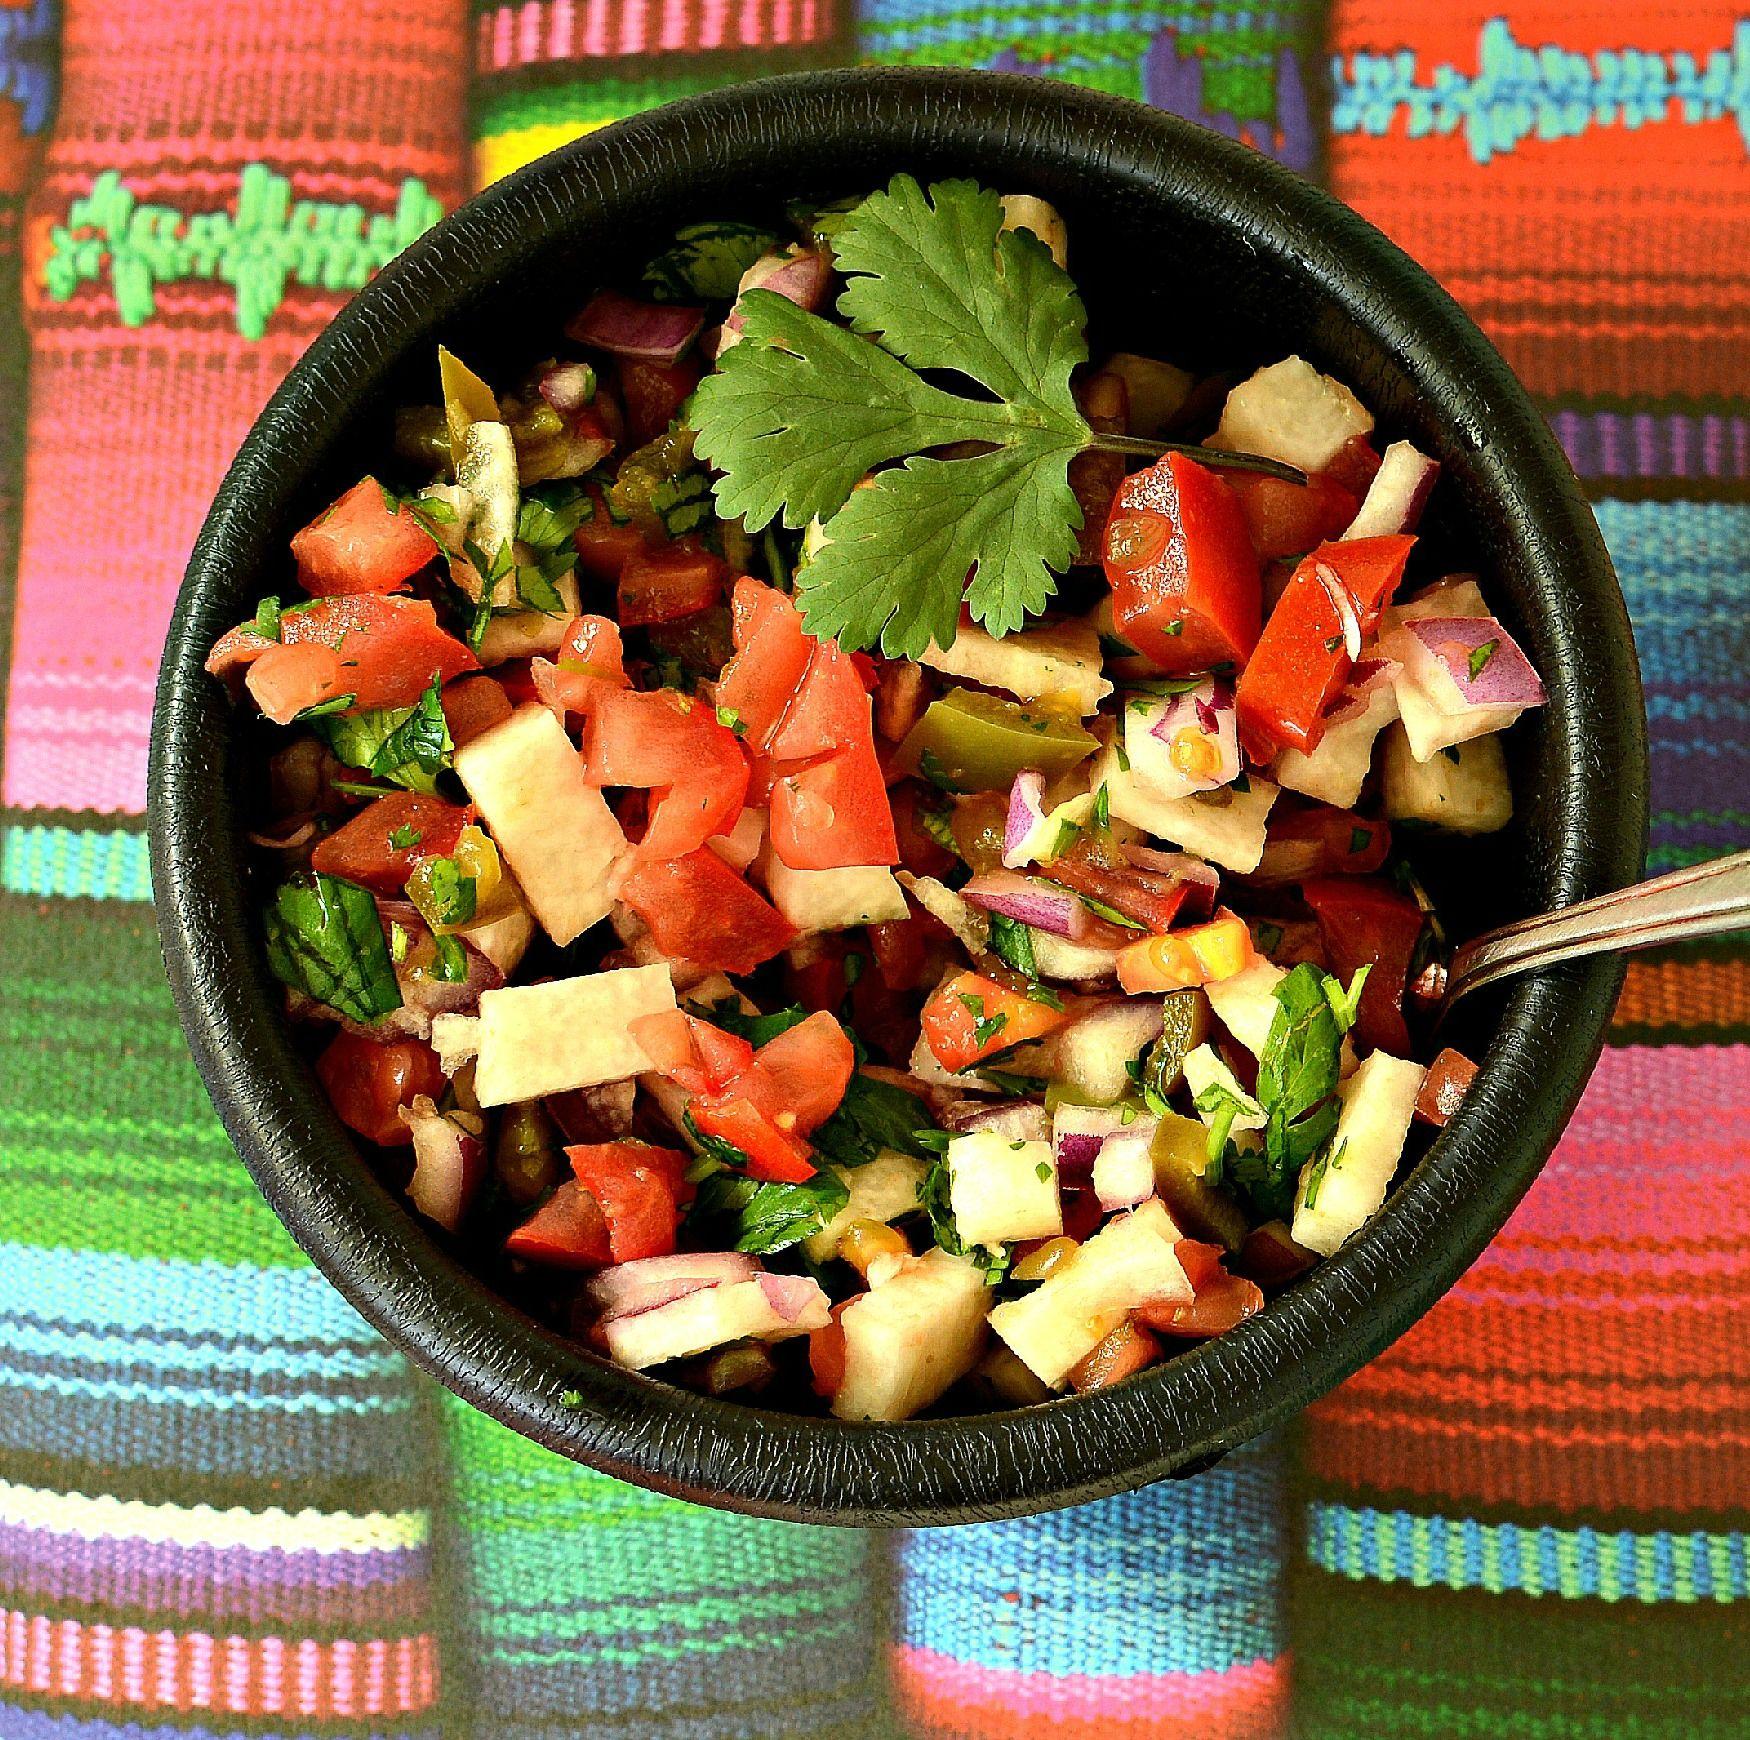 Salsa de jícama y jitomate